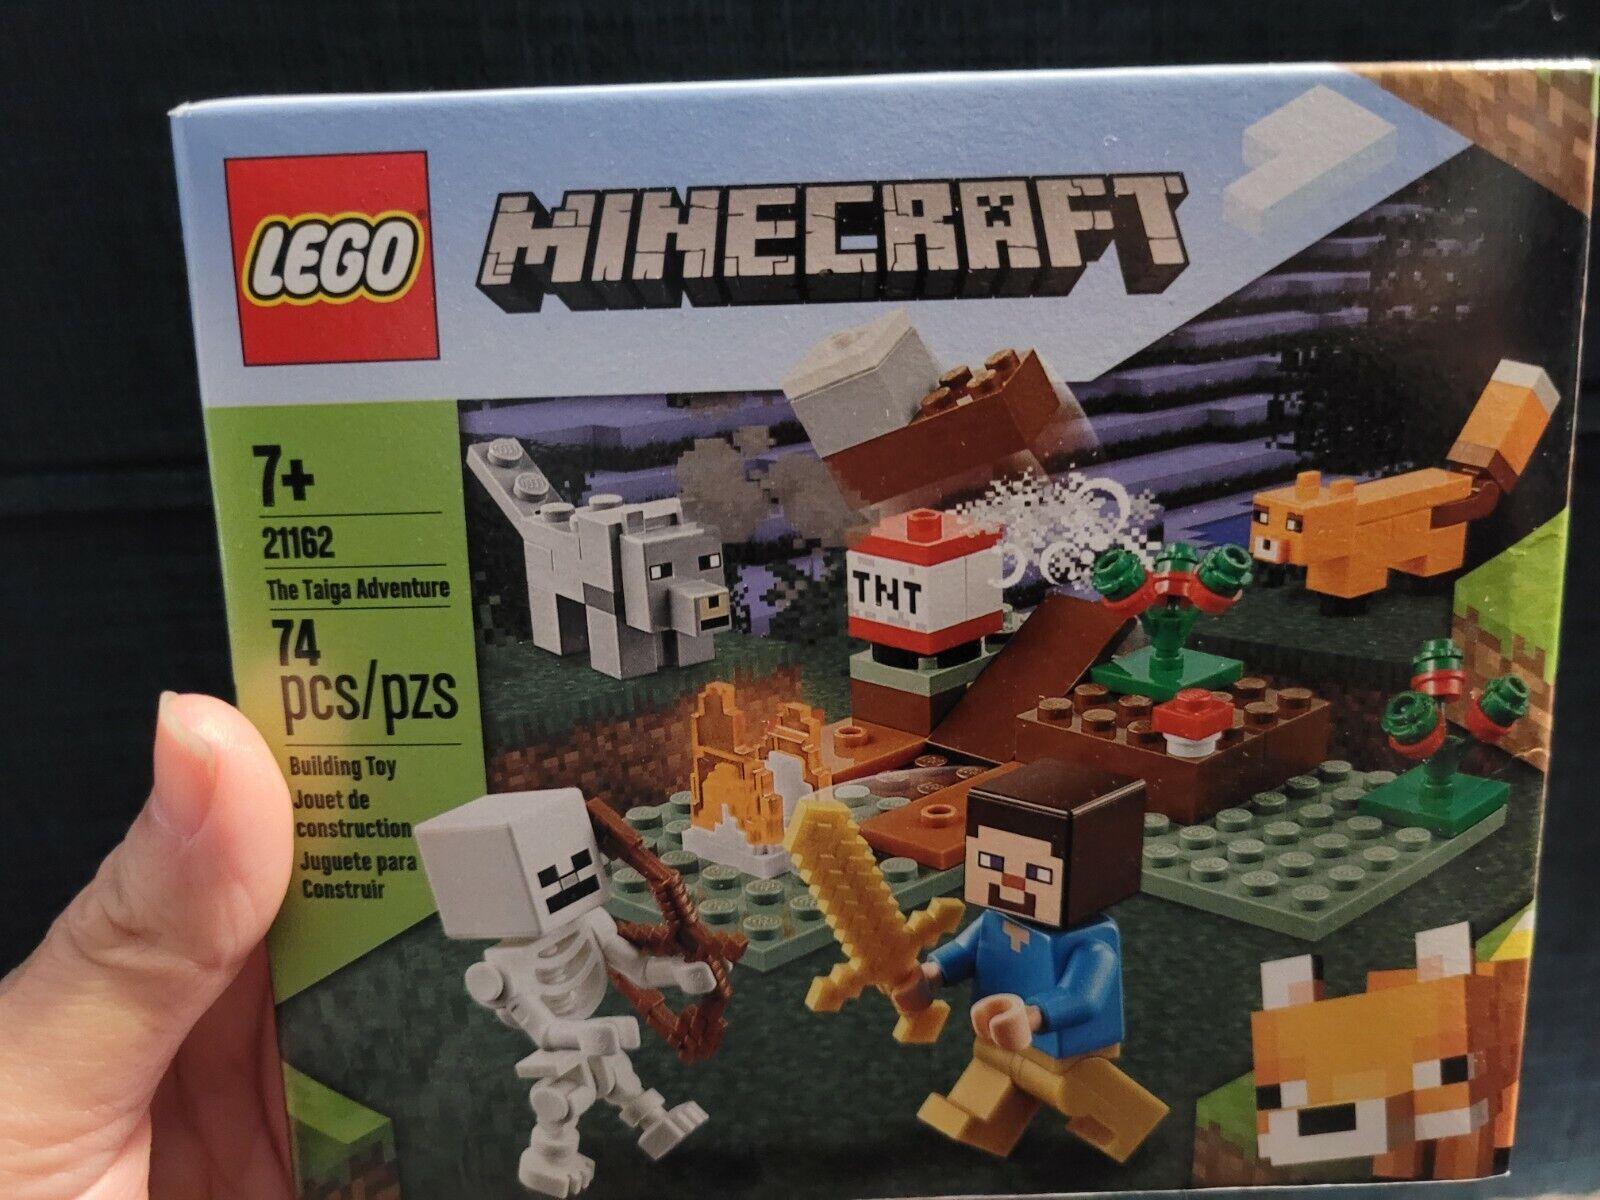 21162 LEGO Minecraft The Taiga Adventure Set 74 Pieces Age 7+